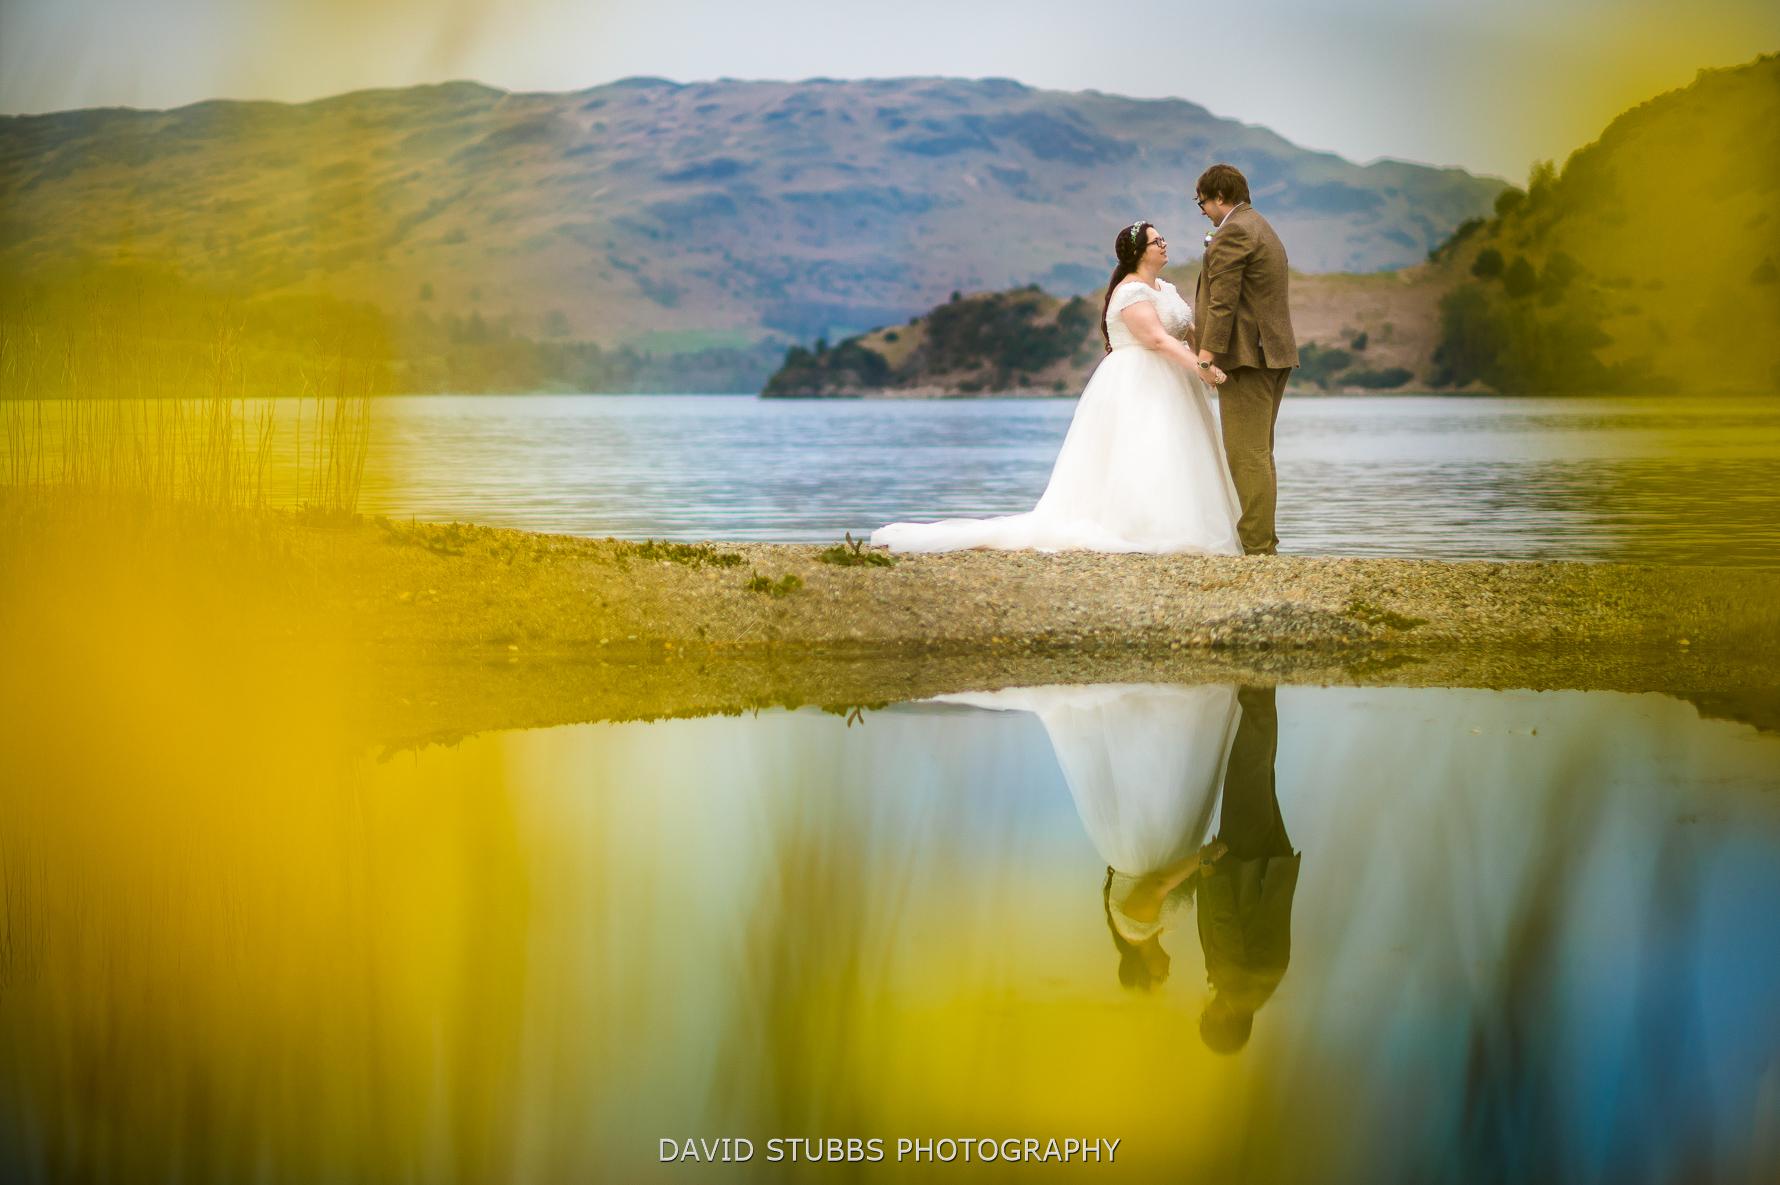 ullwater weddings